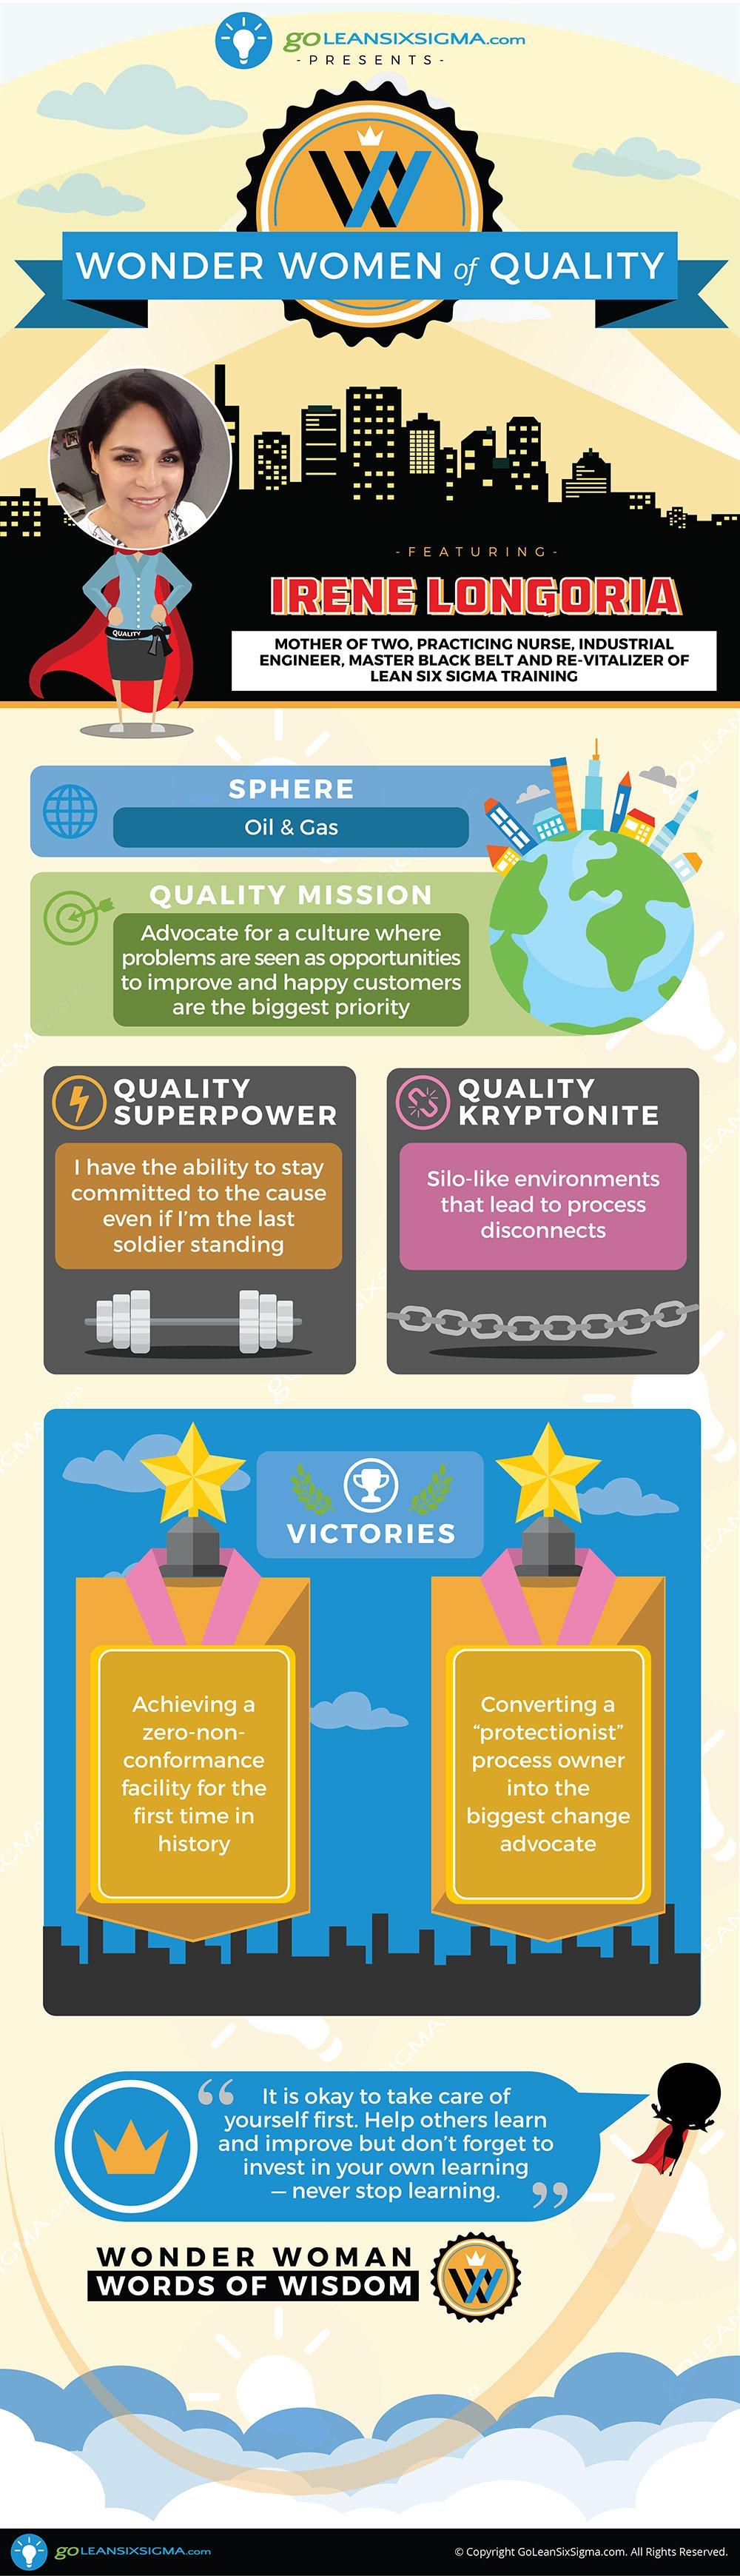 Wonder Women of Quality: Irene Longoria - GoLeanSixSigma.com